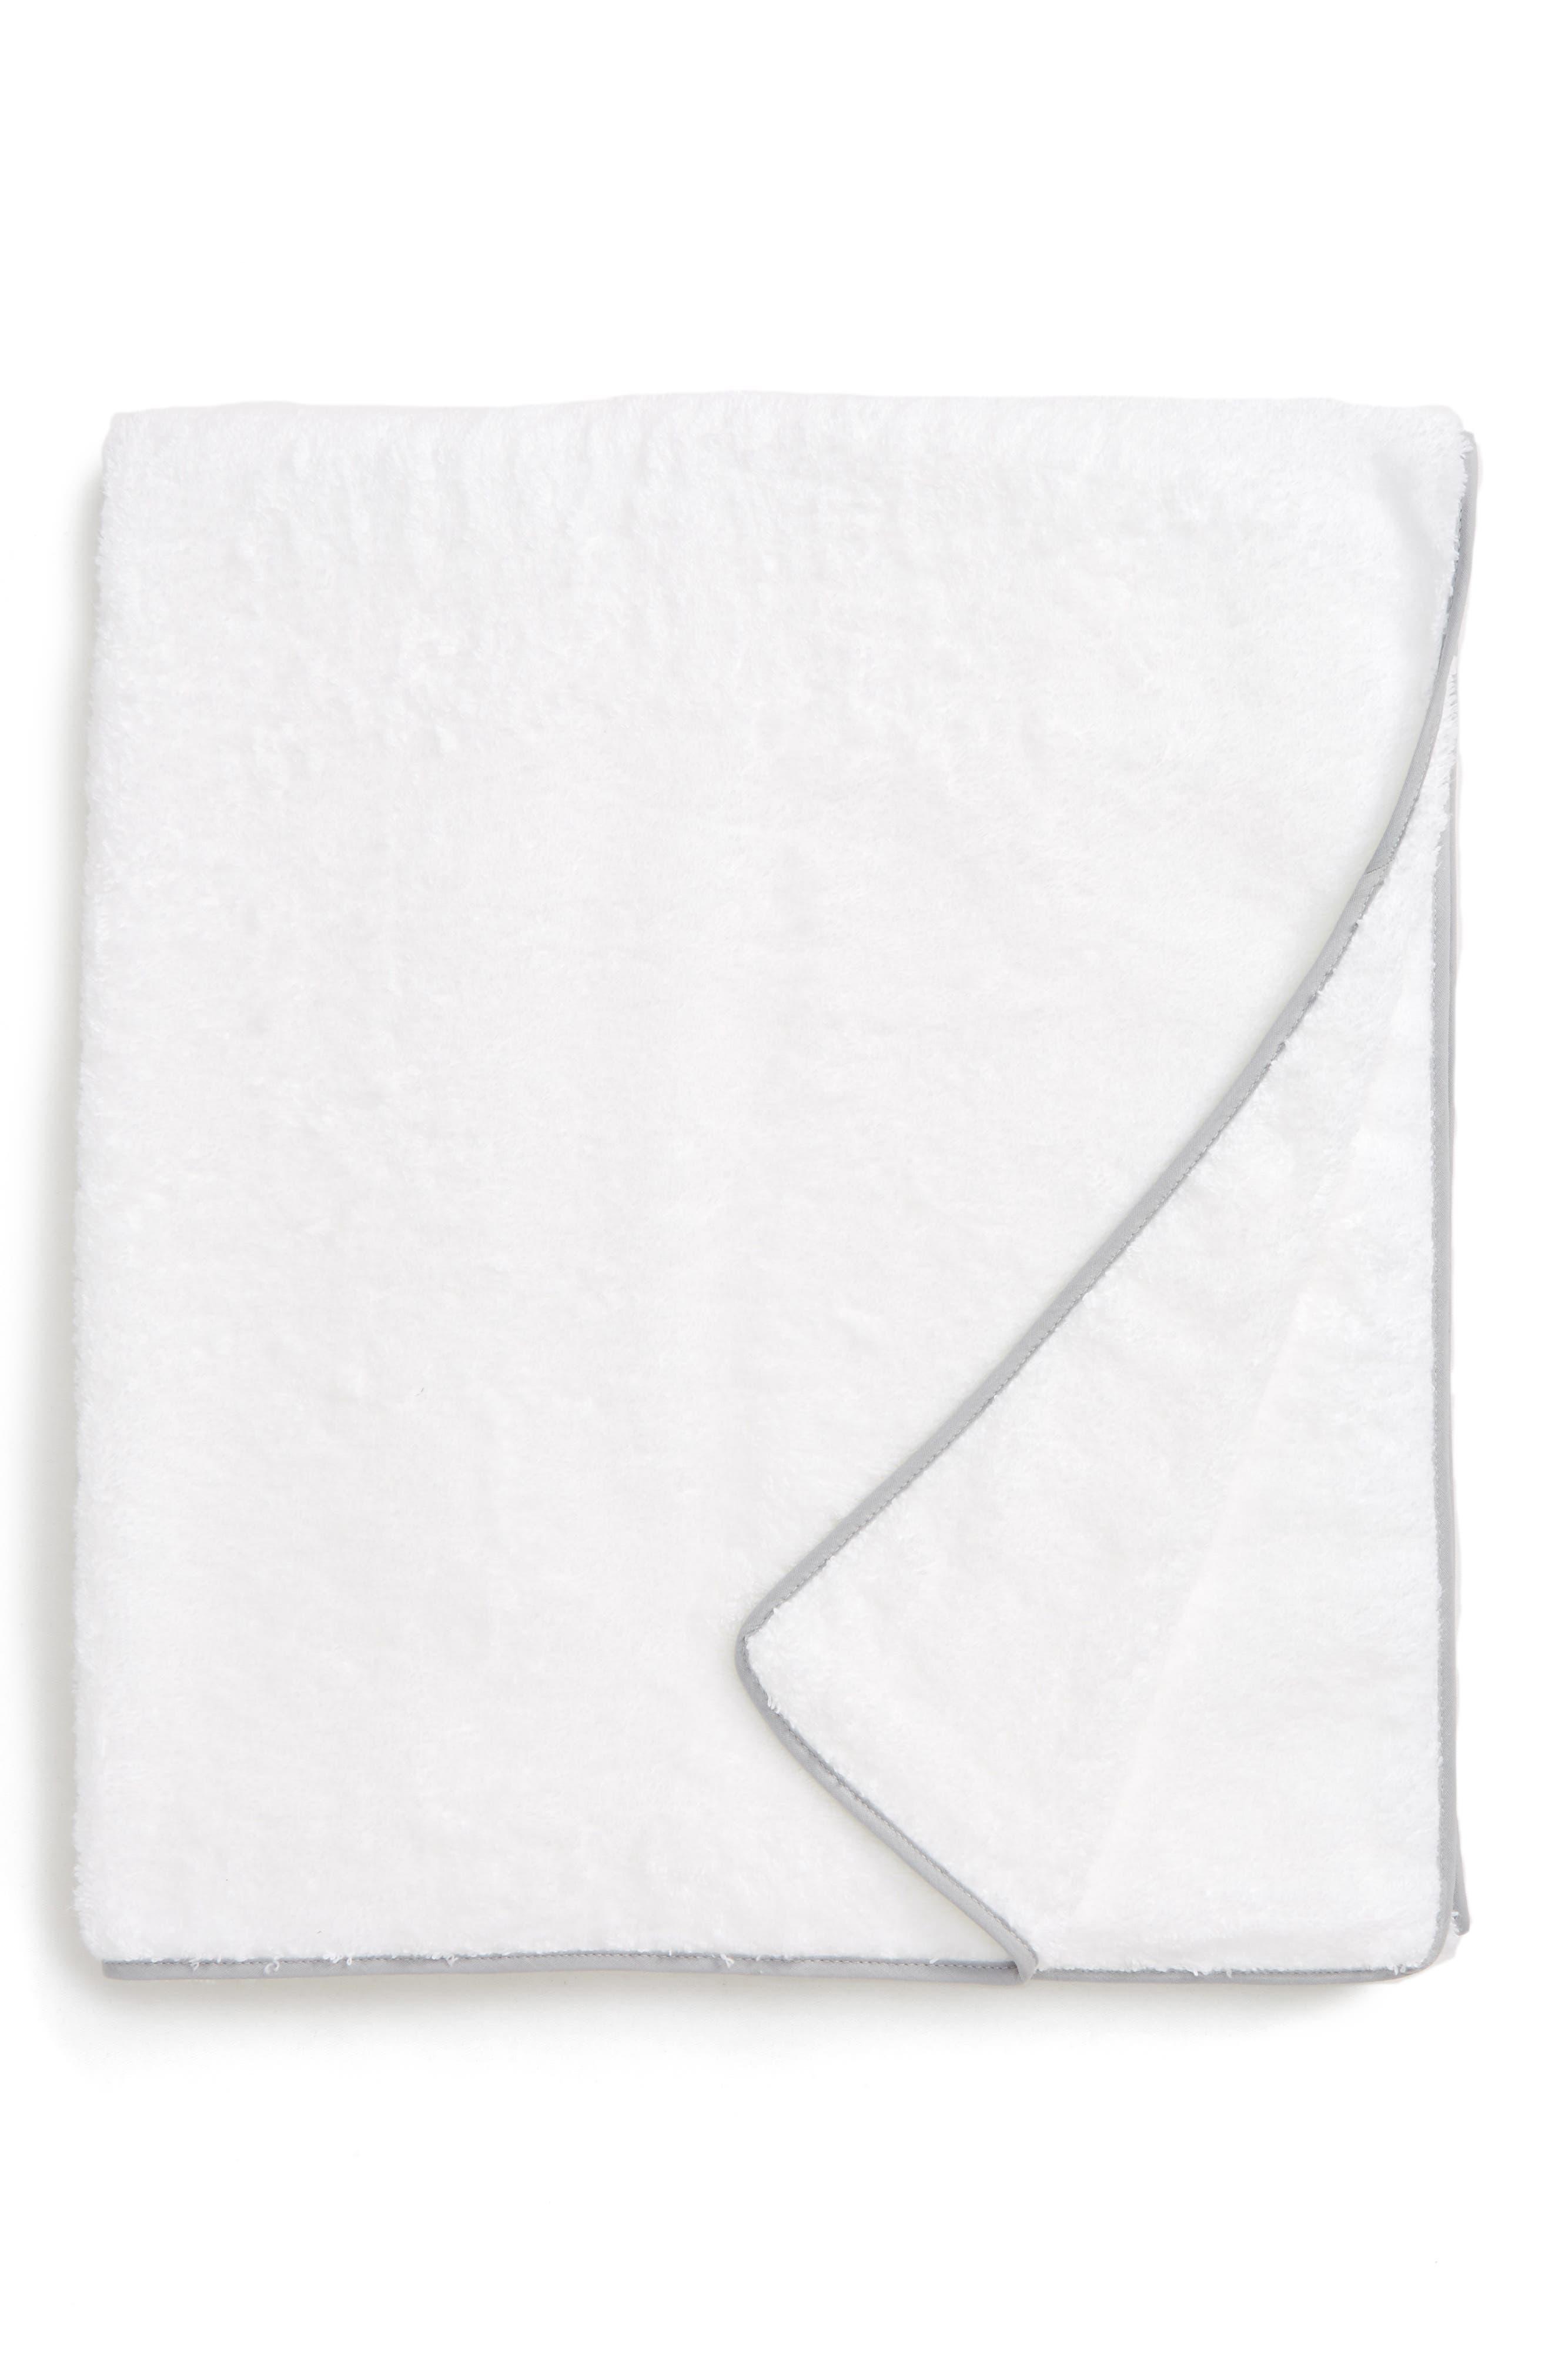 Cairo Bath Towel,                             Main thumbnail 1, color,                             Silver